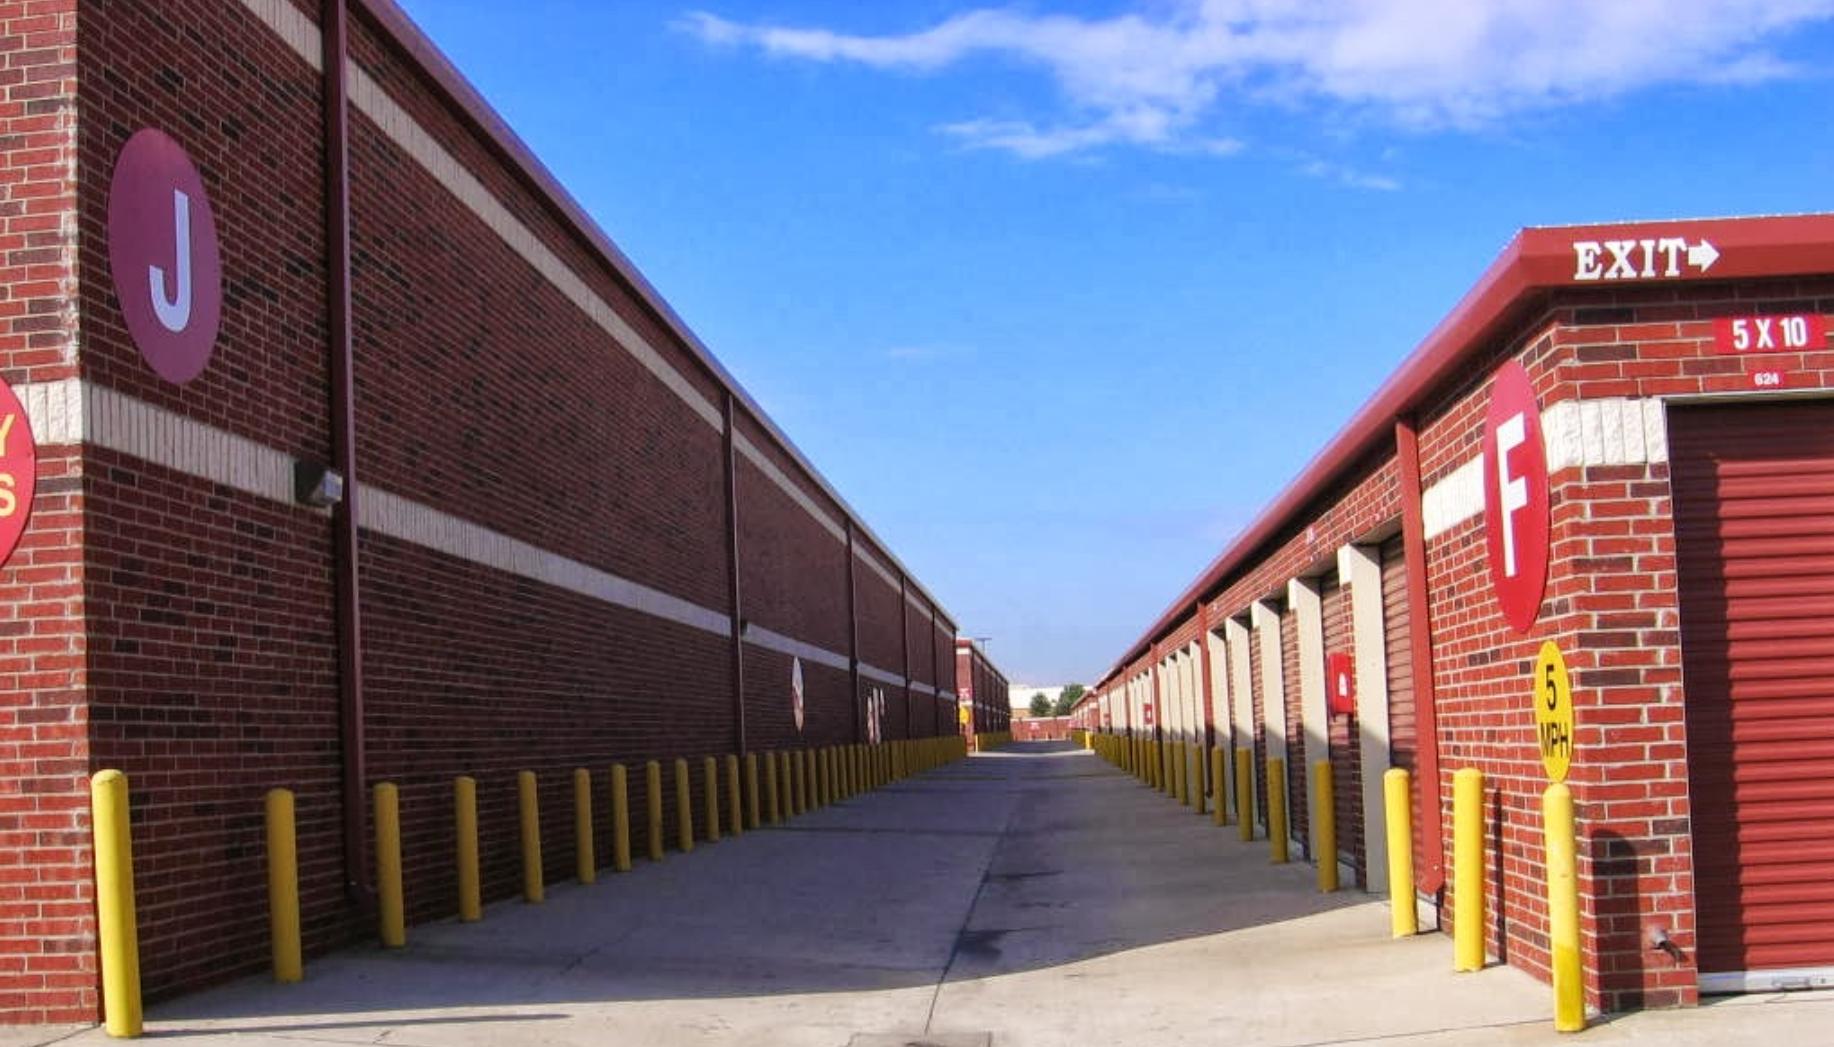 All Storage - Belt Line - Carrollton, TX 75006 - (972)325-0952 | ShowMeLocal.com